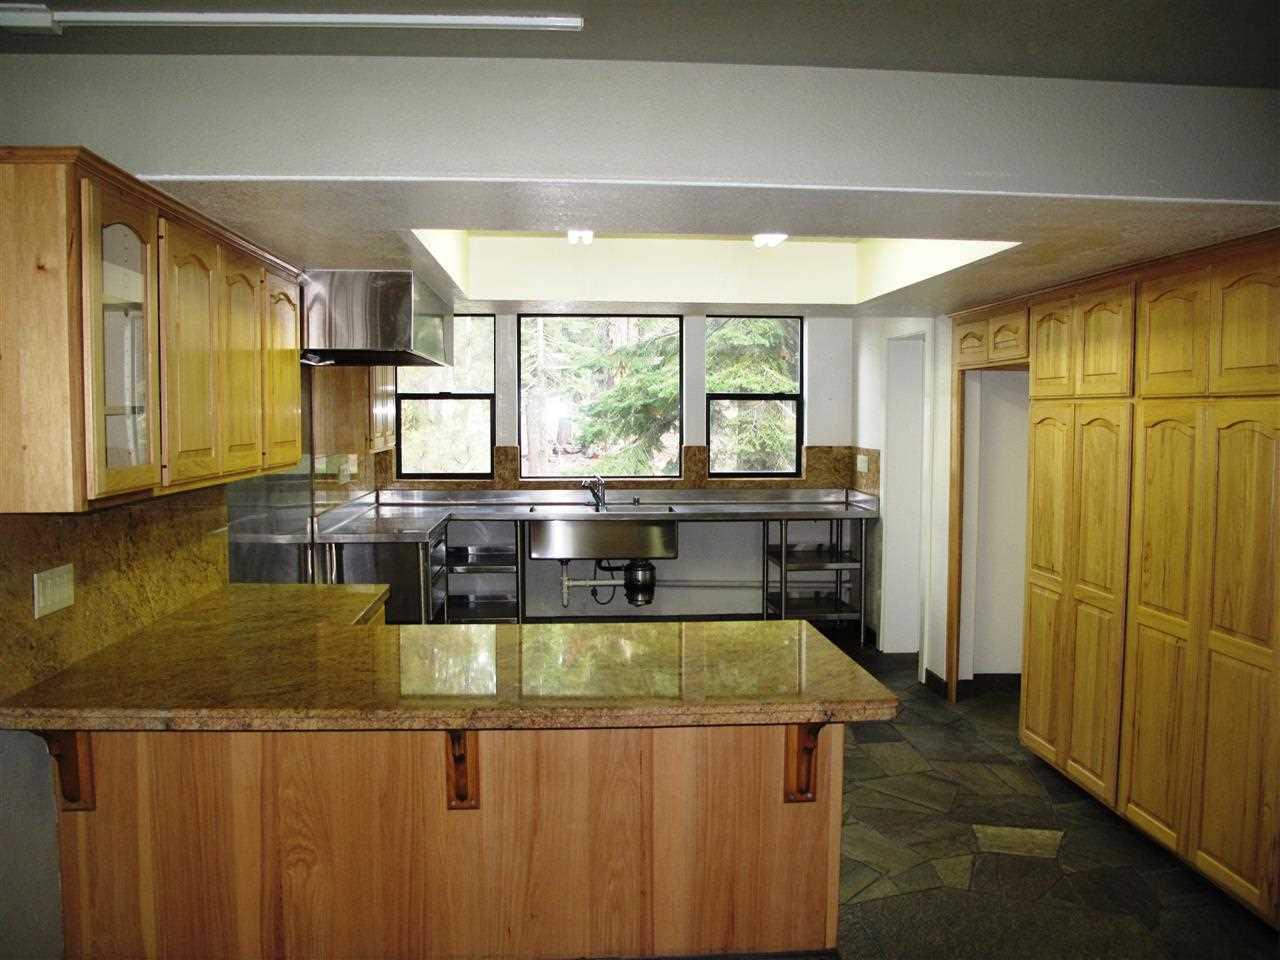 Additional photo for property listing at 3000 Polaris Road 3000 Polaris Road 塔霍湖城, 加利福尼亚州 96145 美国